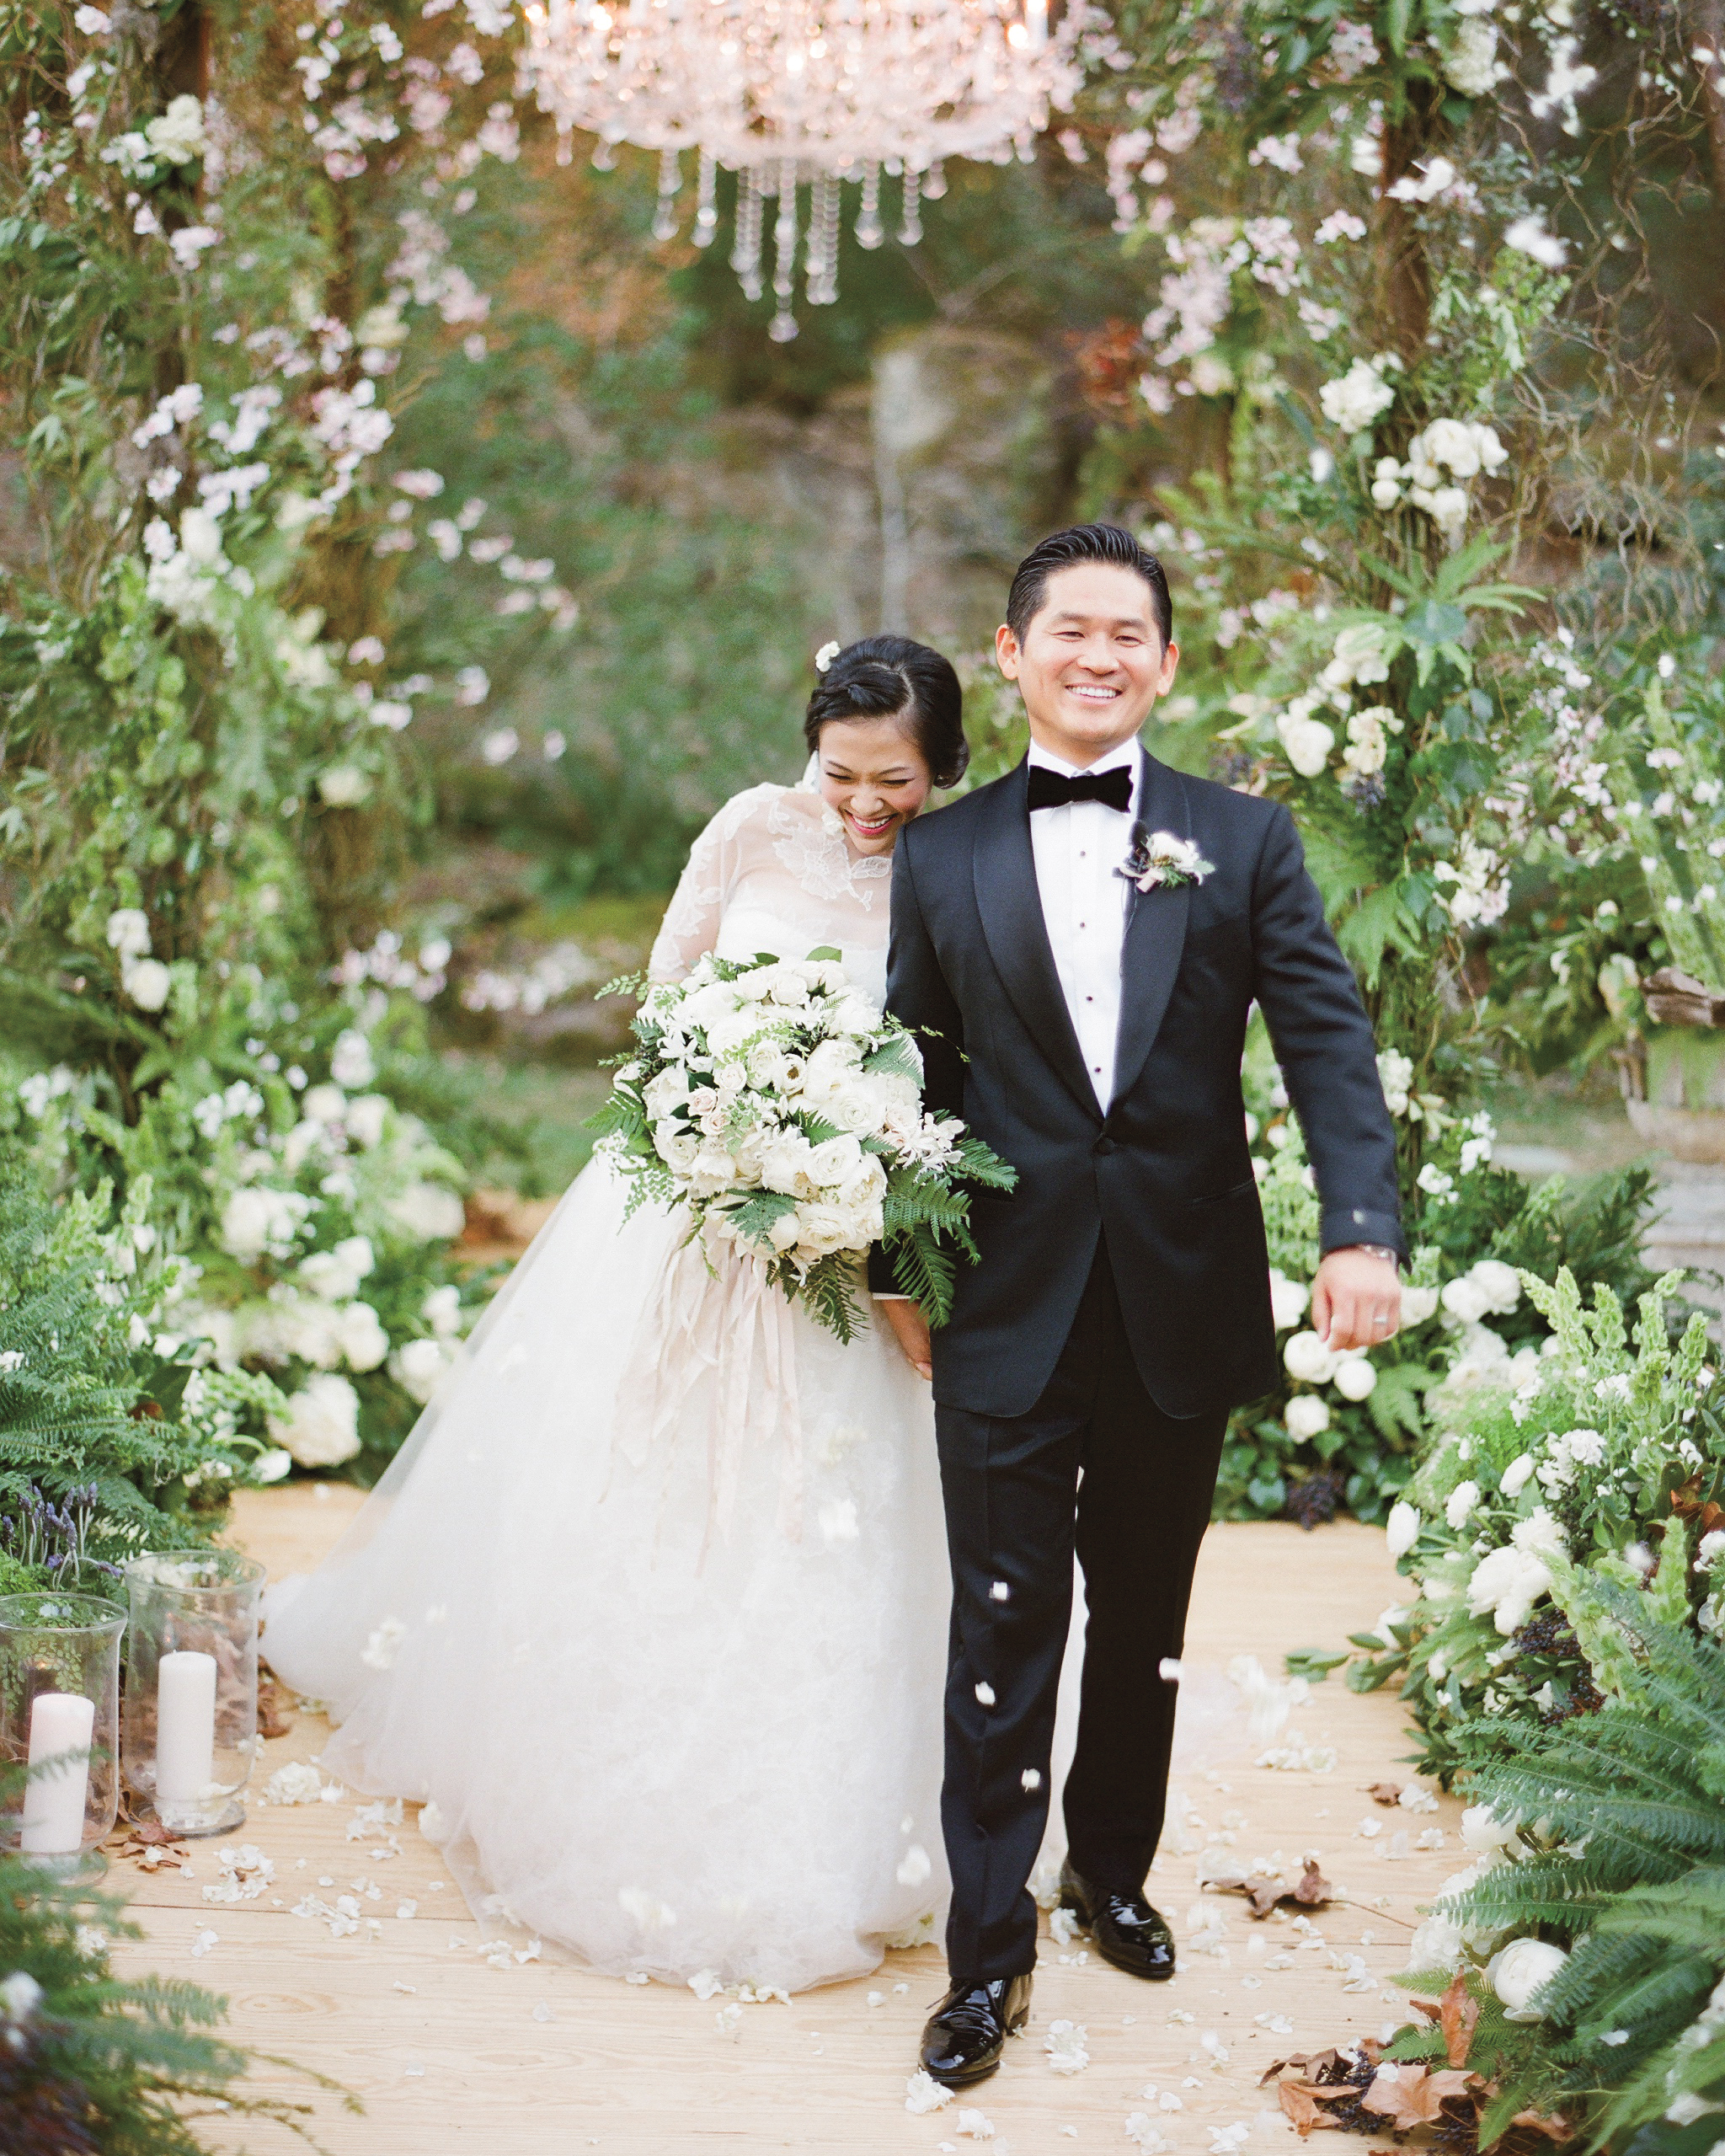 adriana-han-wedding-58330004-s111814.jpg